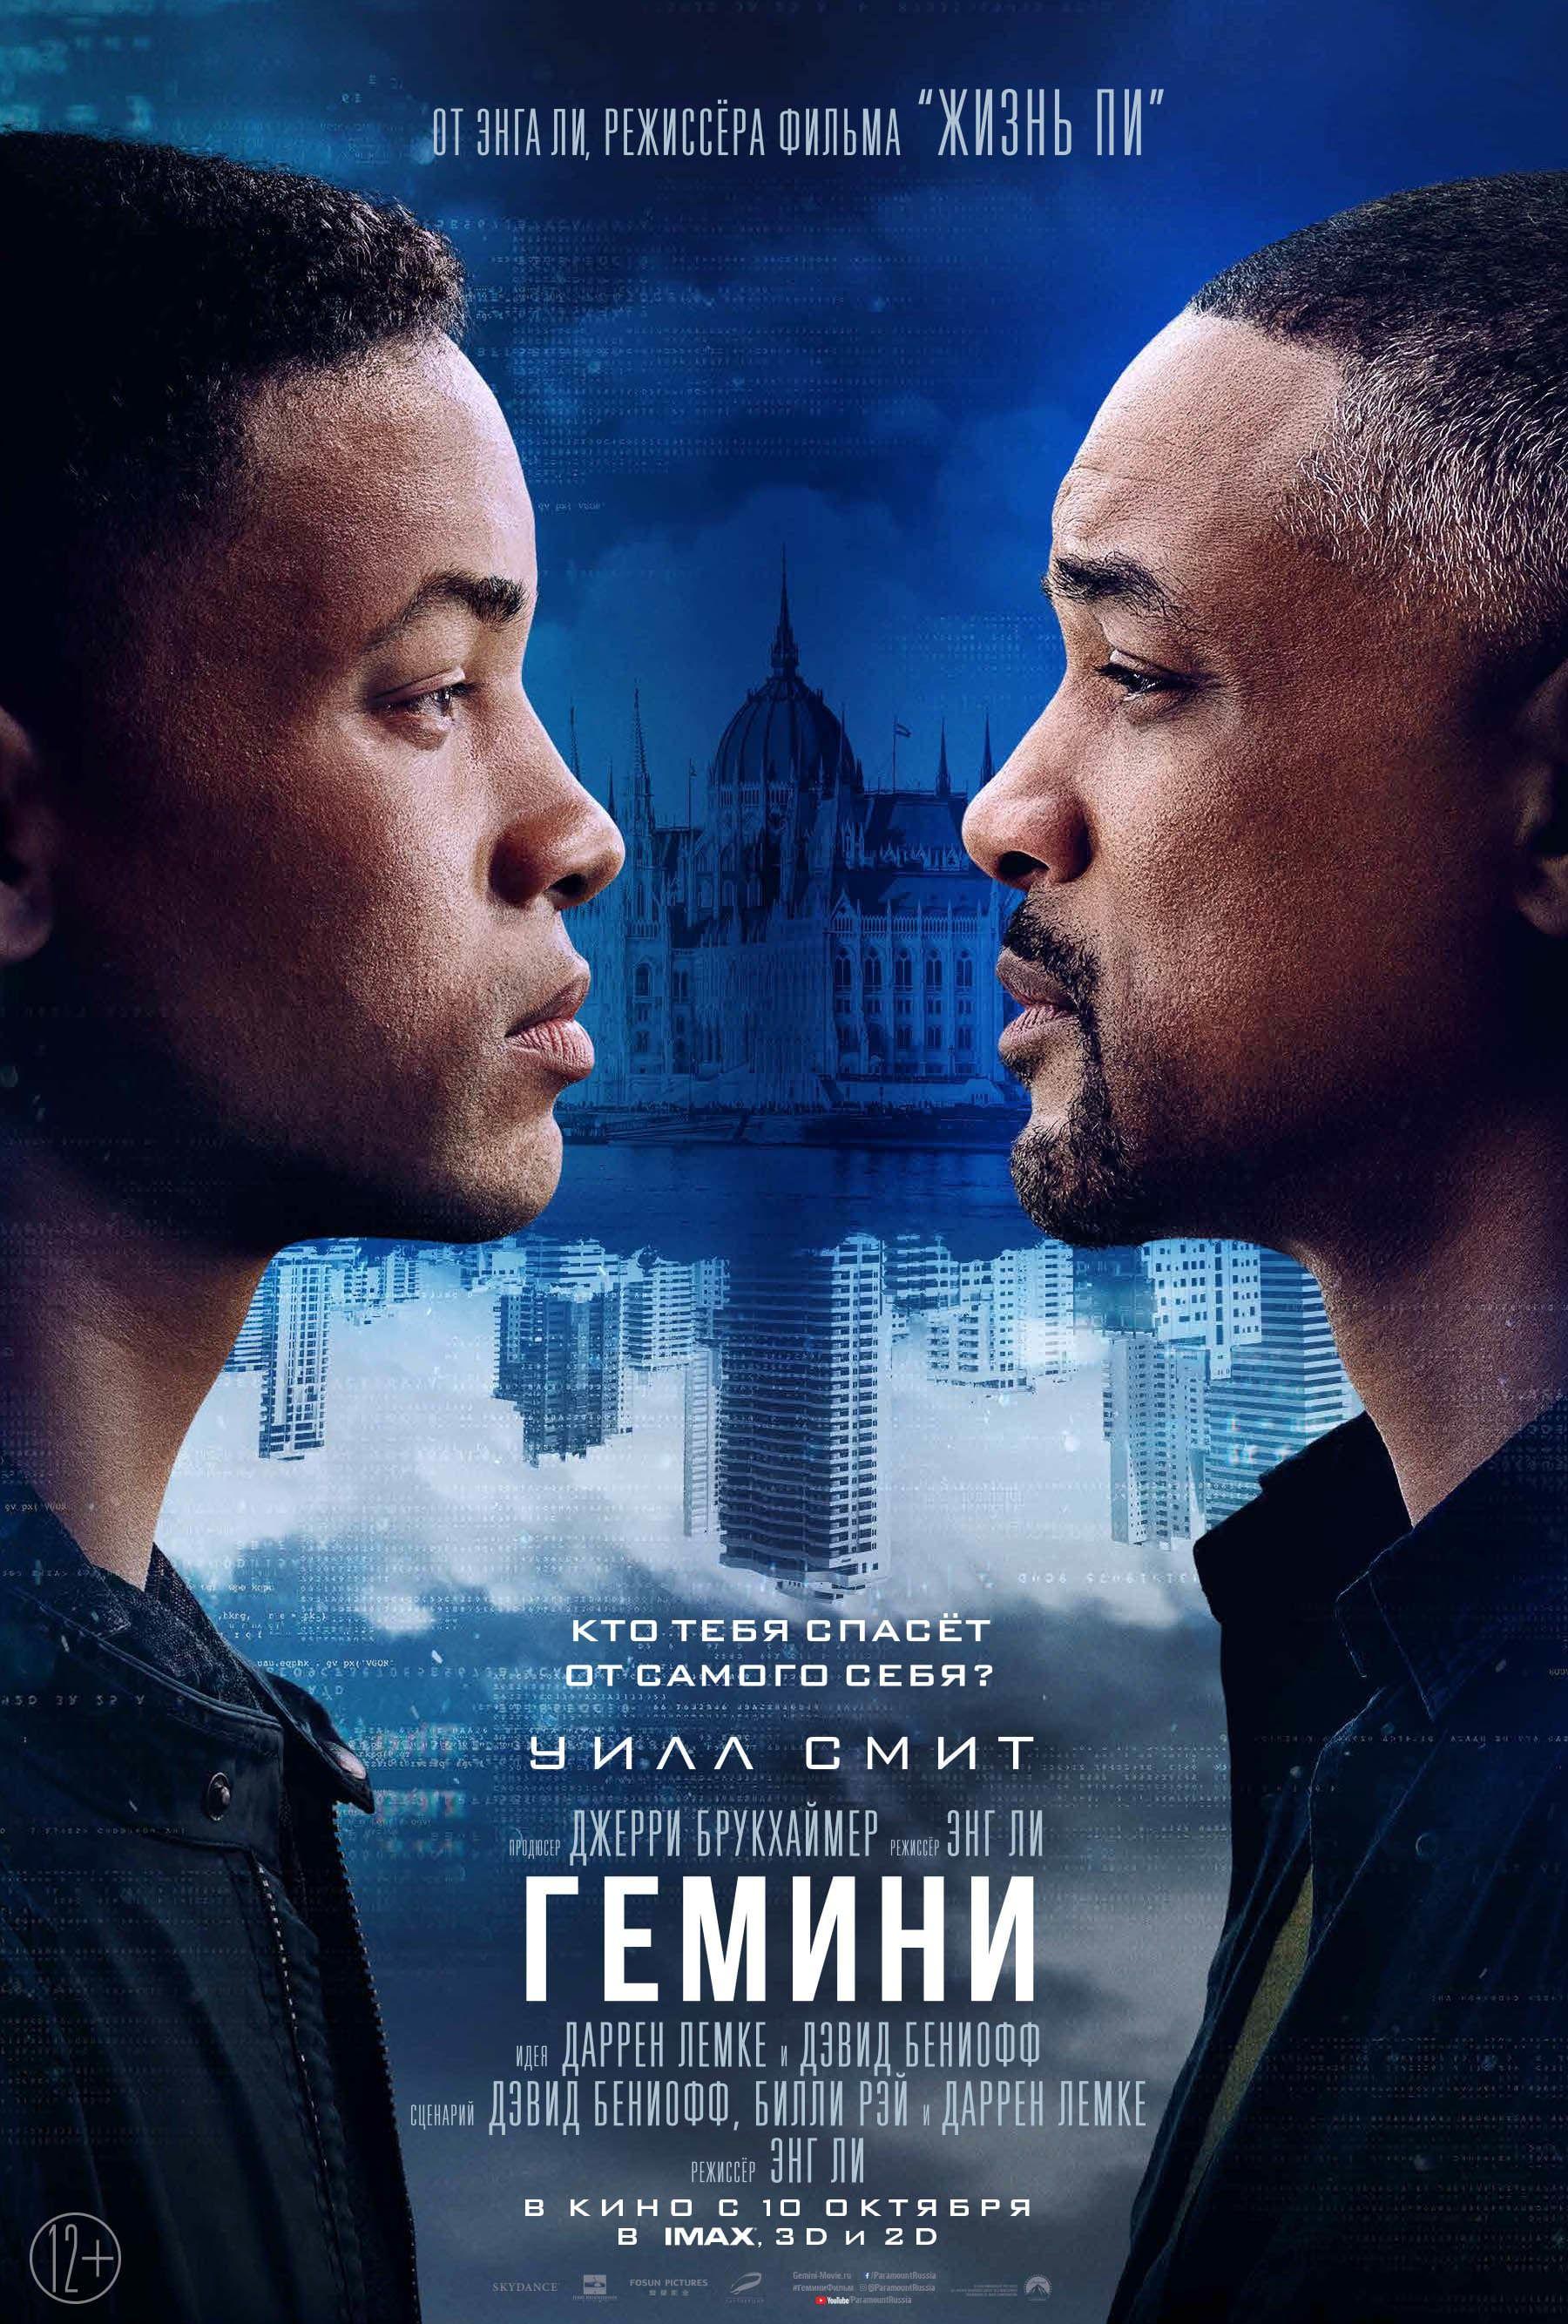 Assistir Filme Completo Gemini Man Gemini Man Man Movies Full Movies